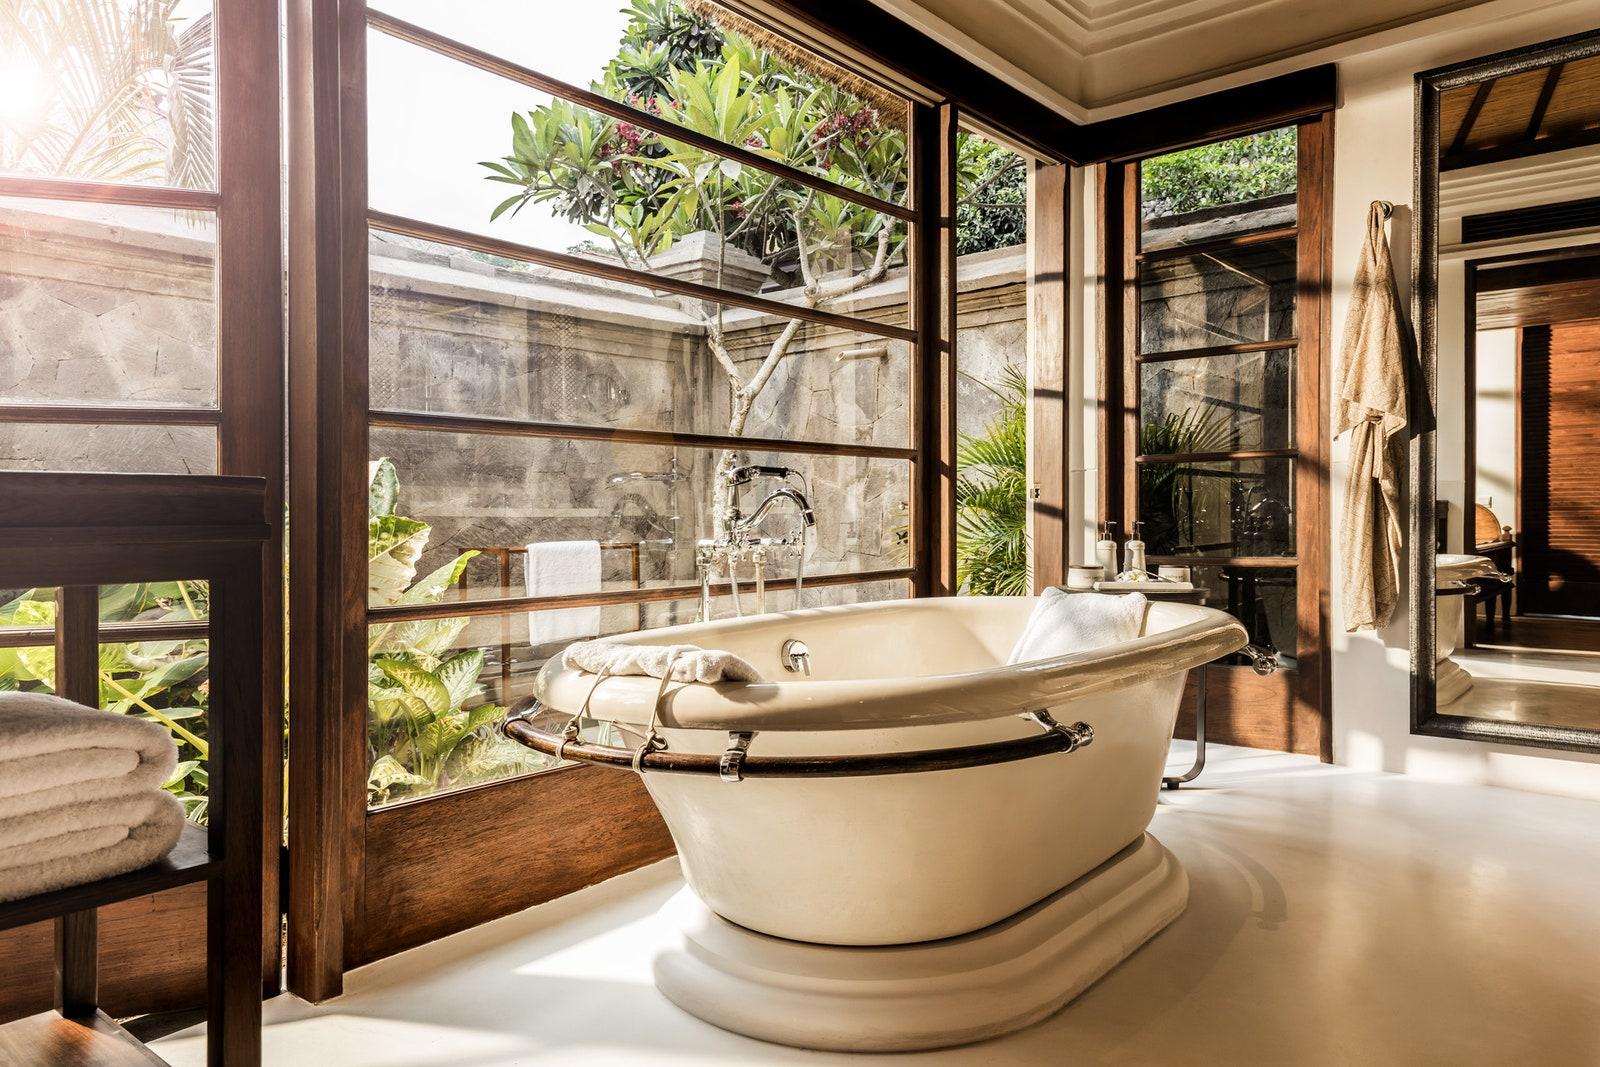 Desain kamar mandi di Four Seasons Resort Bali, Indonesia - source: architecturaldigest.com